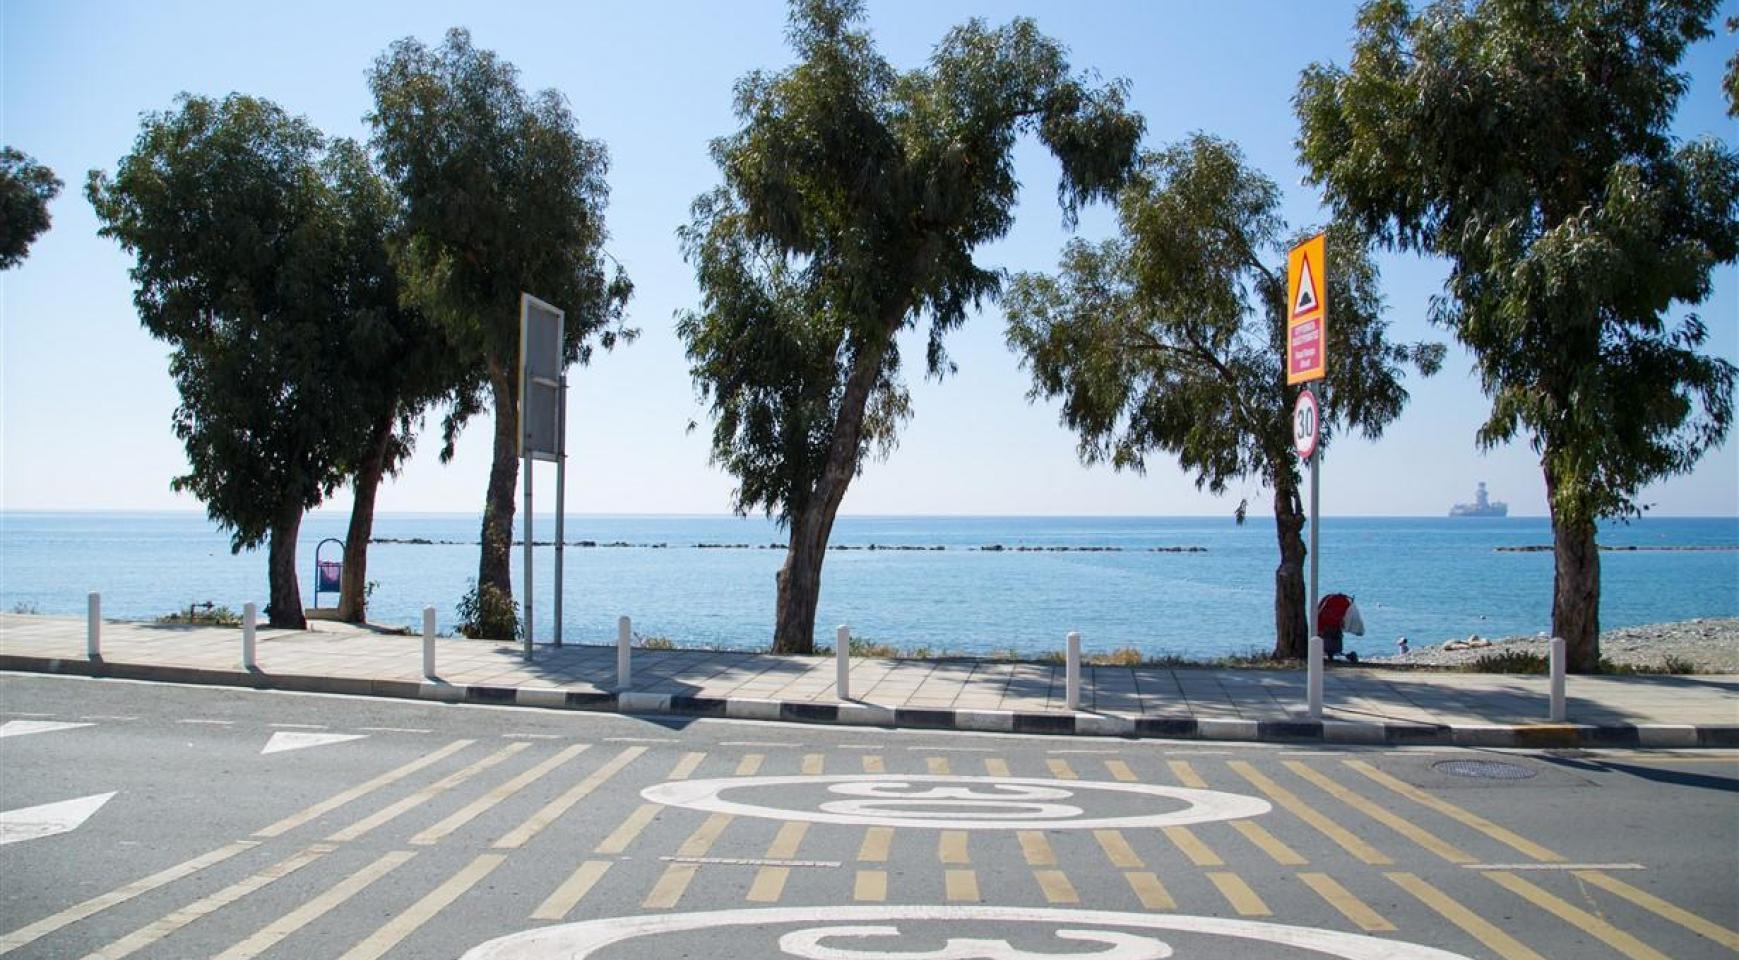 Luxury 2 Bedroom Apartment Mesogios Iris 304 in the Tourist area near the Beach - 40